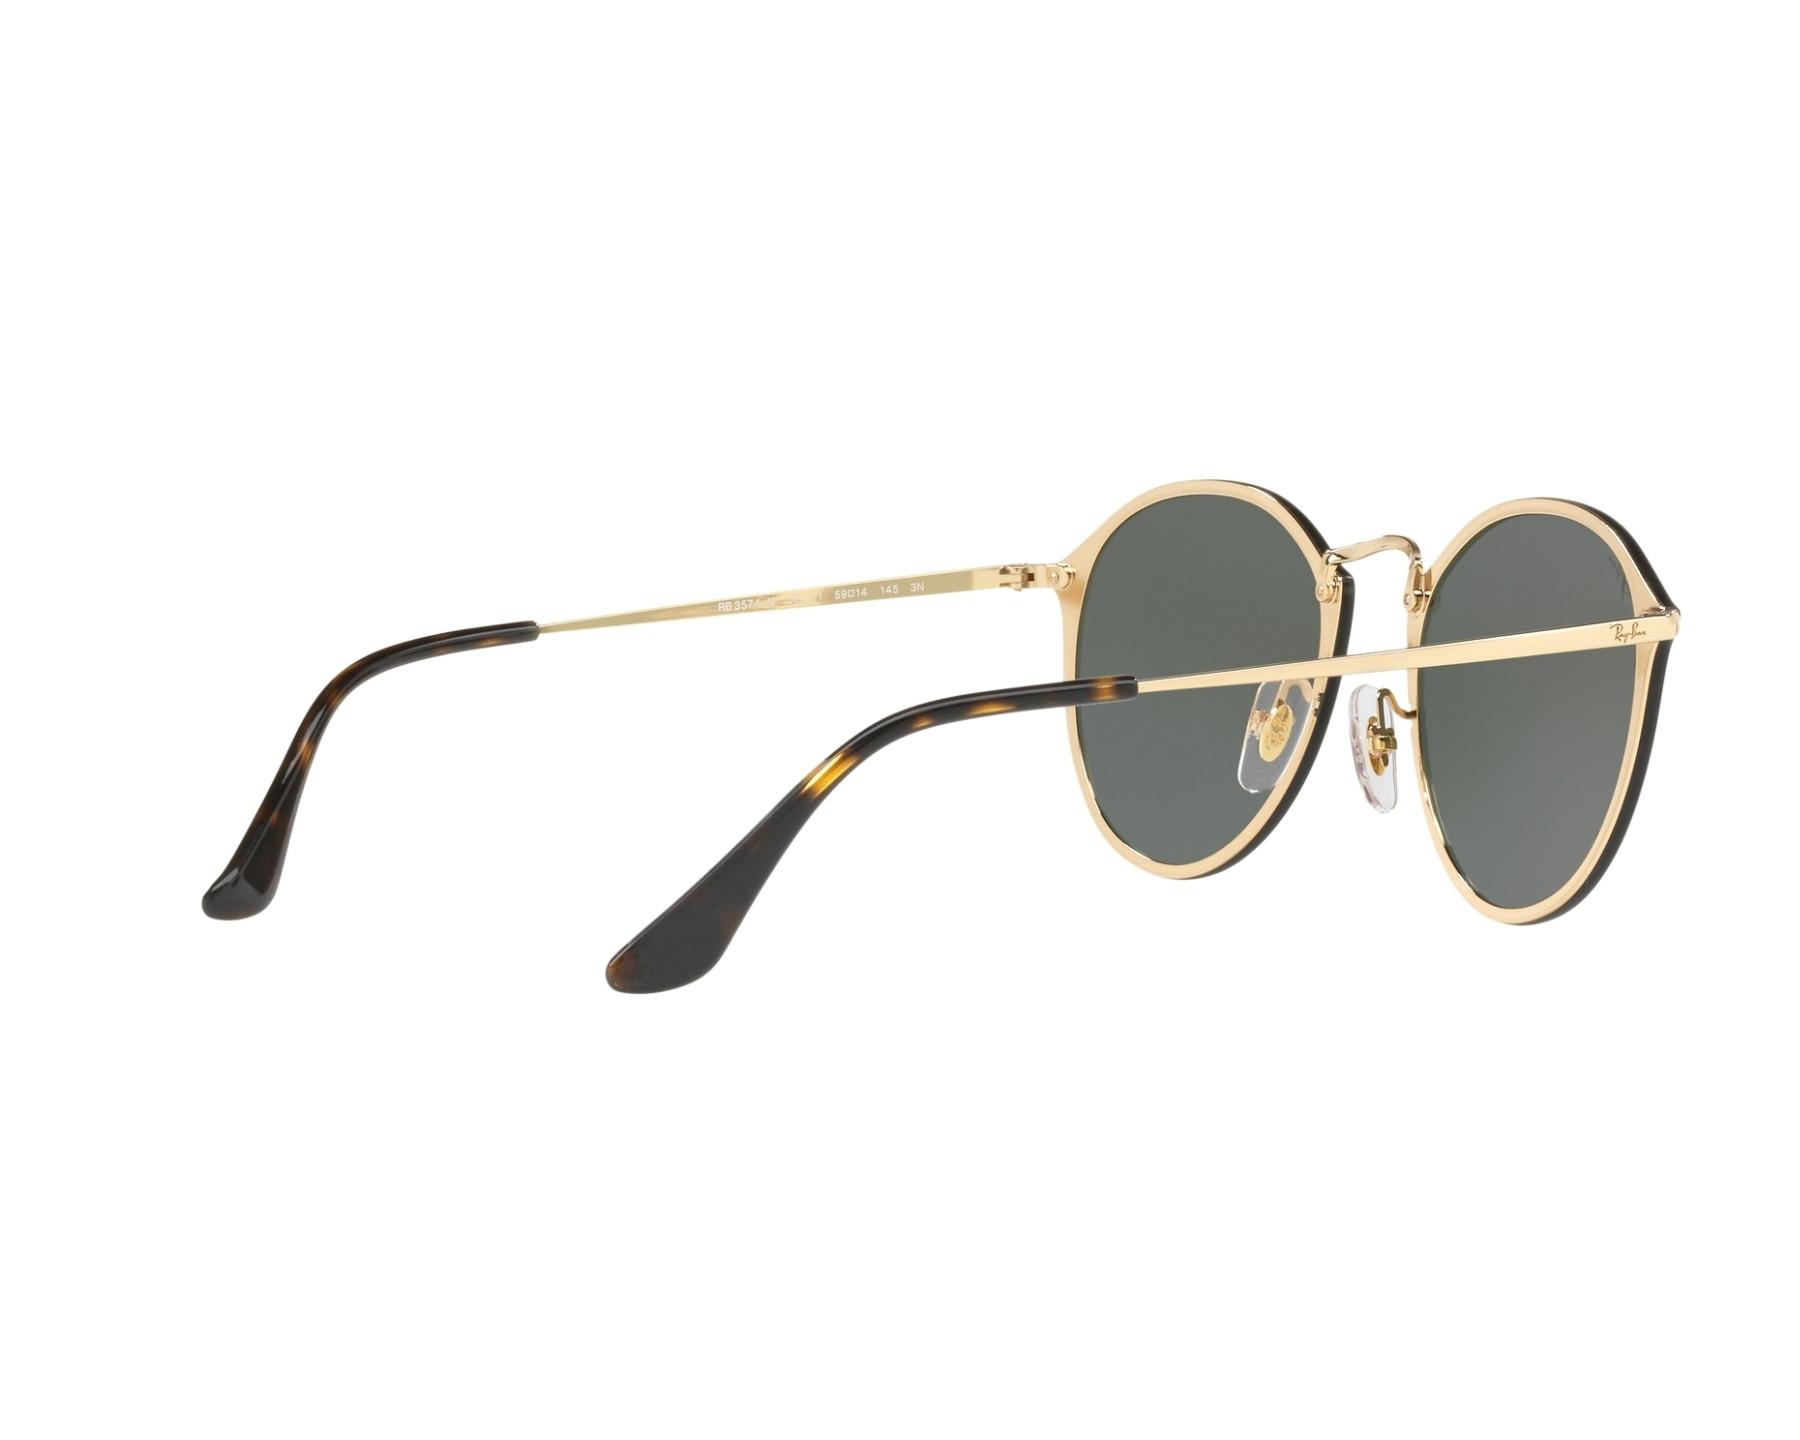 3e579f8659097 Ray-Ban Sunglasses Blaze Round RB-3574-N 001 71